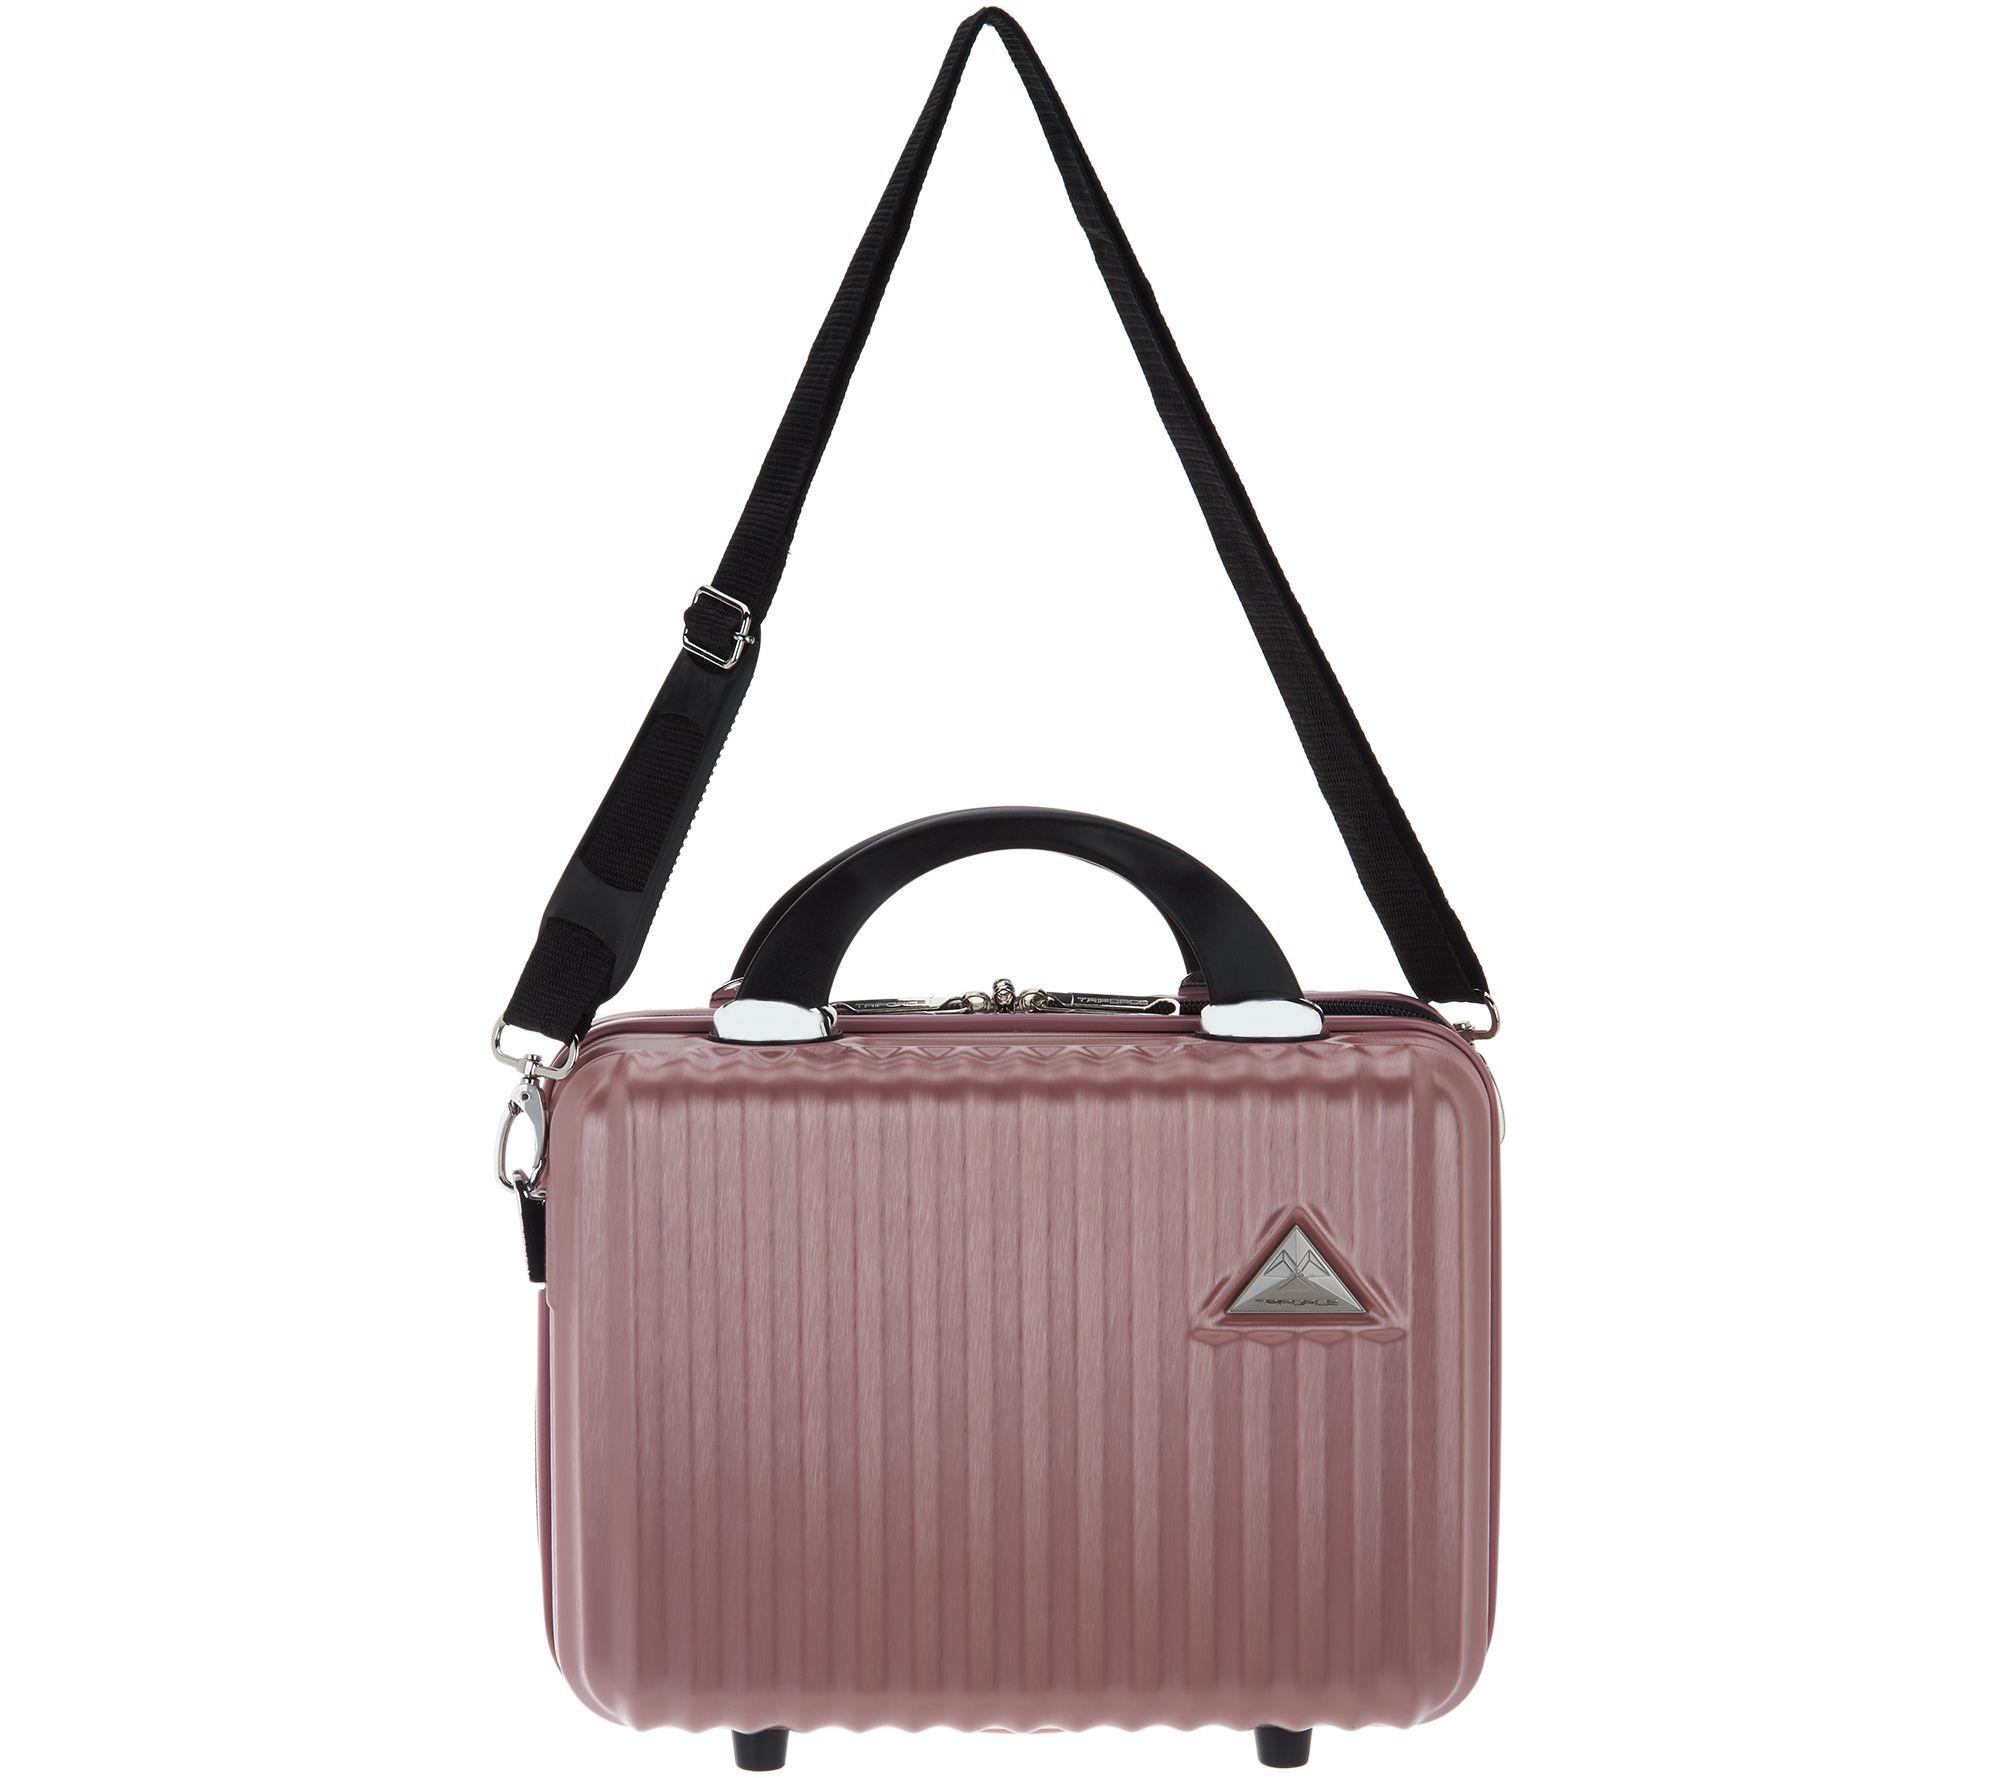 2edbc36172530 Triforce Luggage Hardside Beauty Case - Sobe - Page 1 — QVC.com